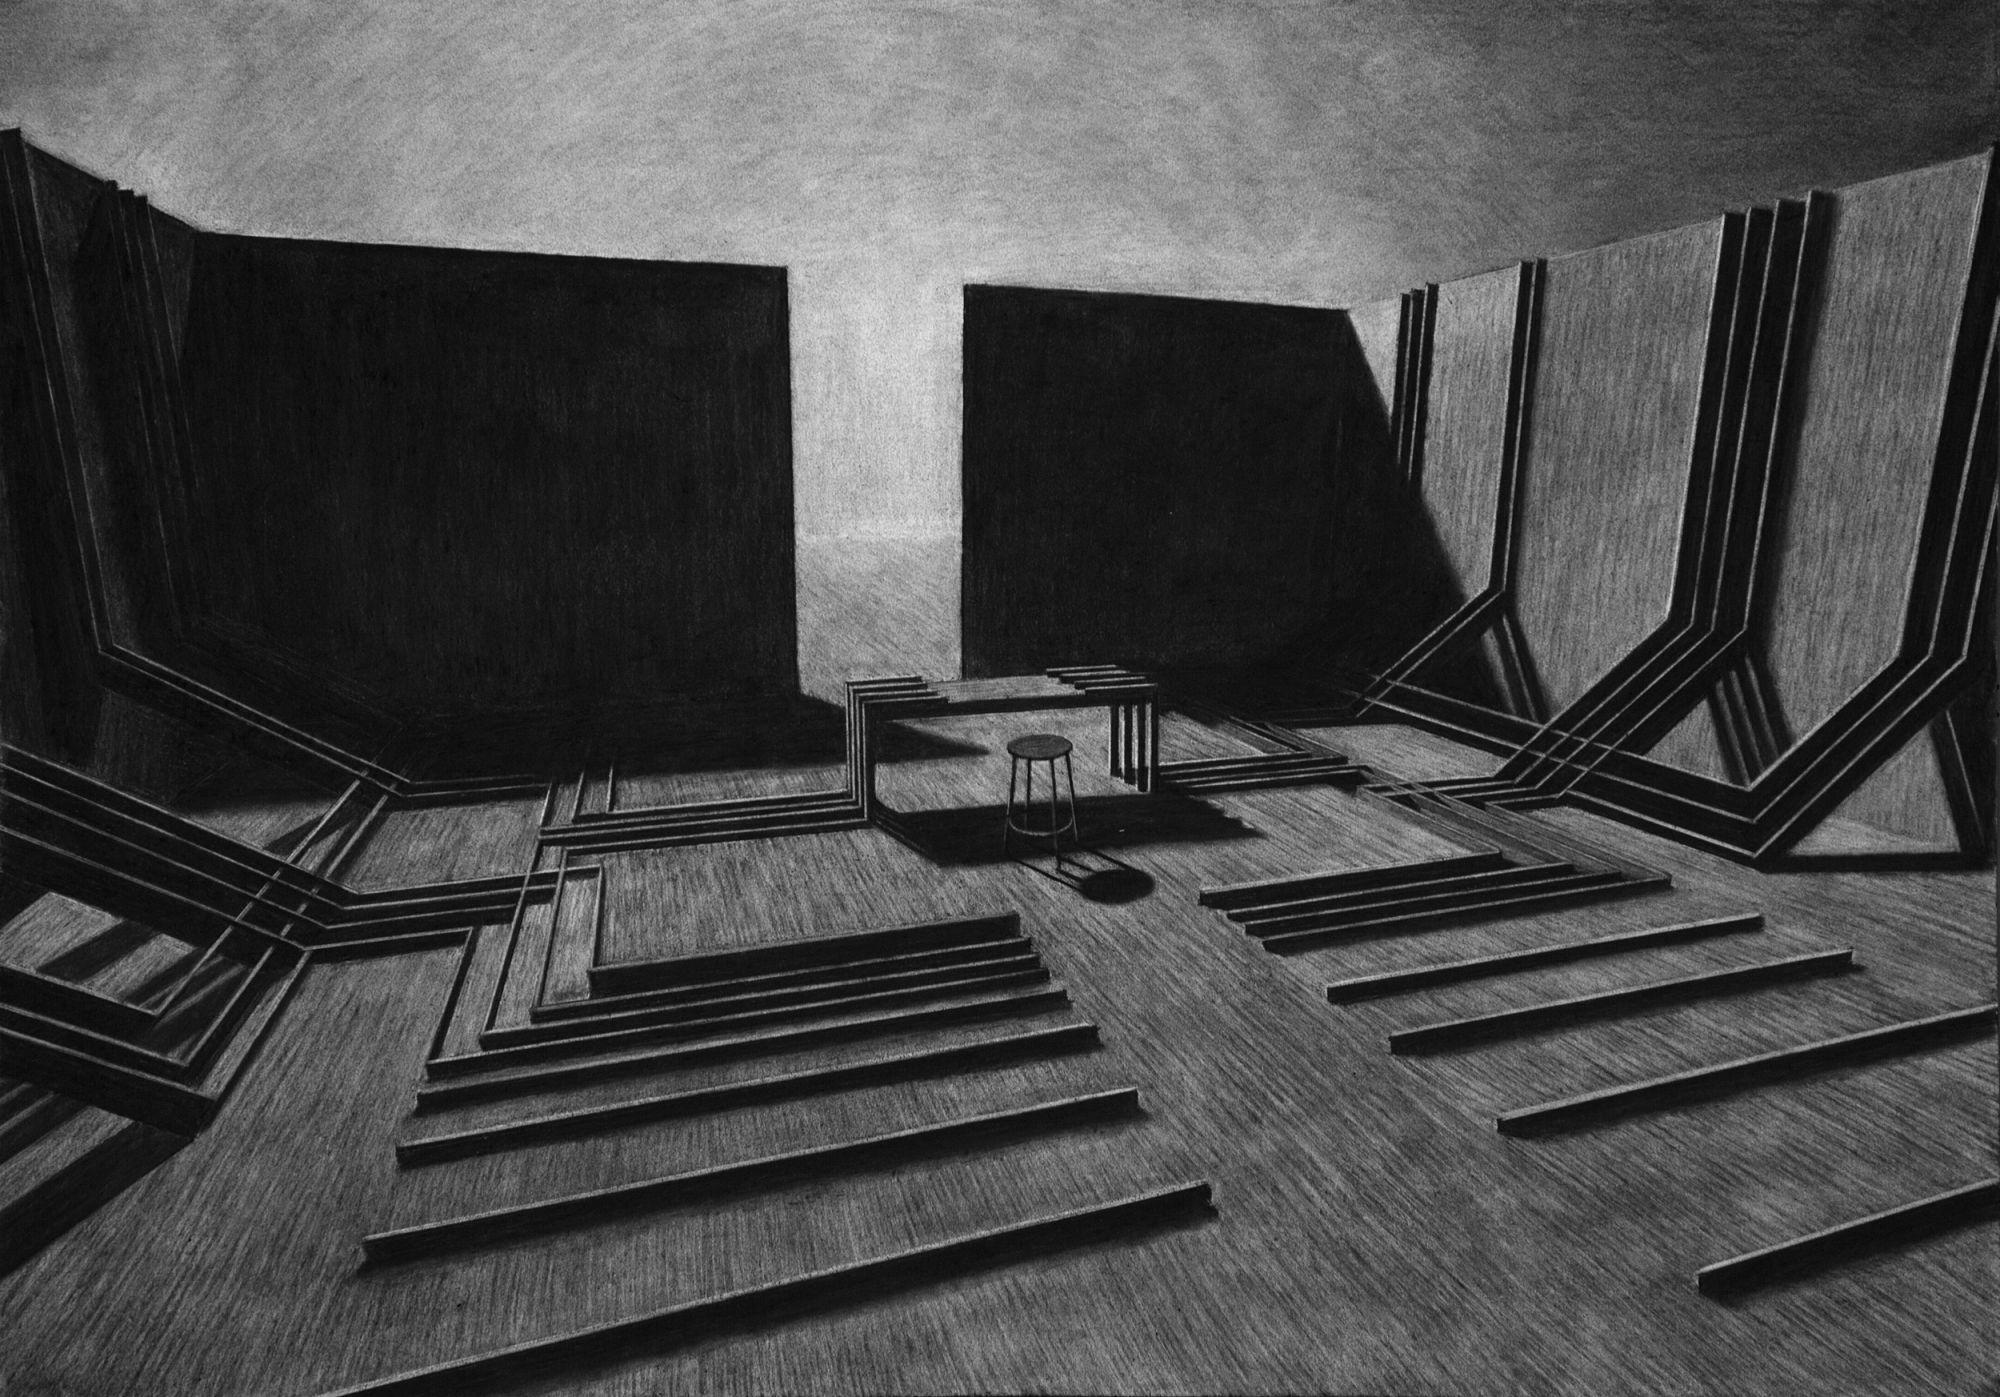 The monolith charcoal drawings levi van veluw